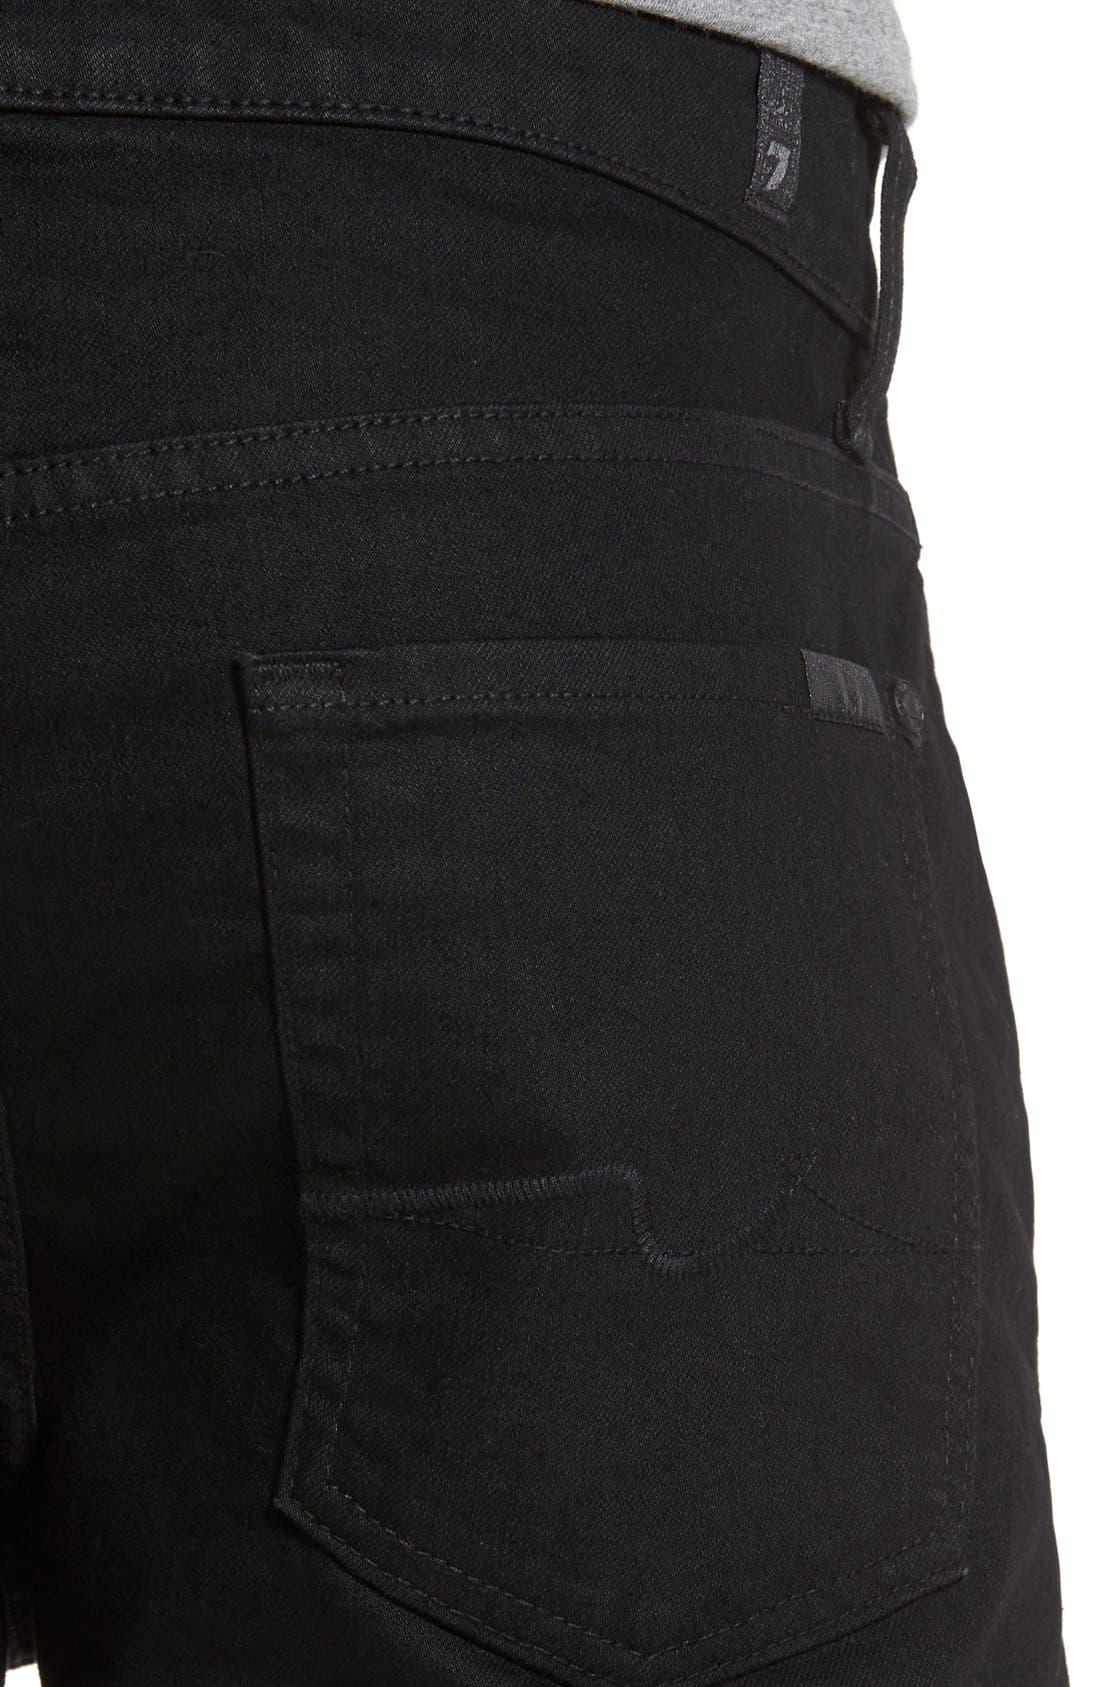 Slimmy Slim Fit Jeans,                             Alternate thumbnail 6, color,                             004